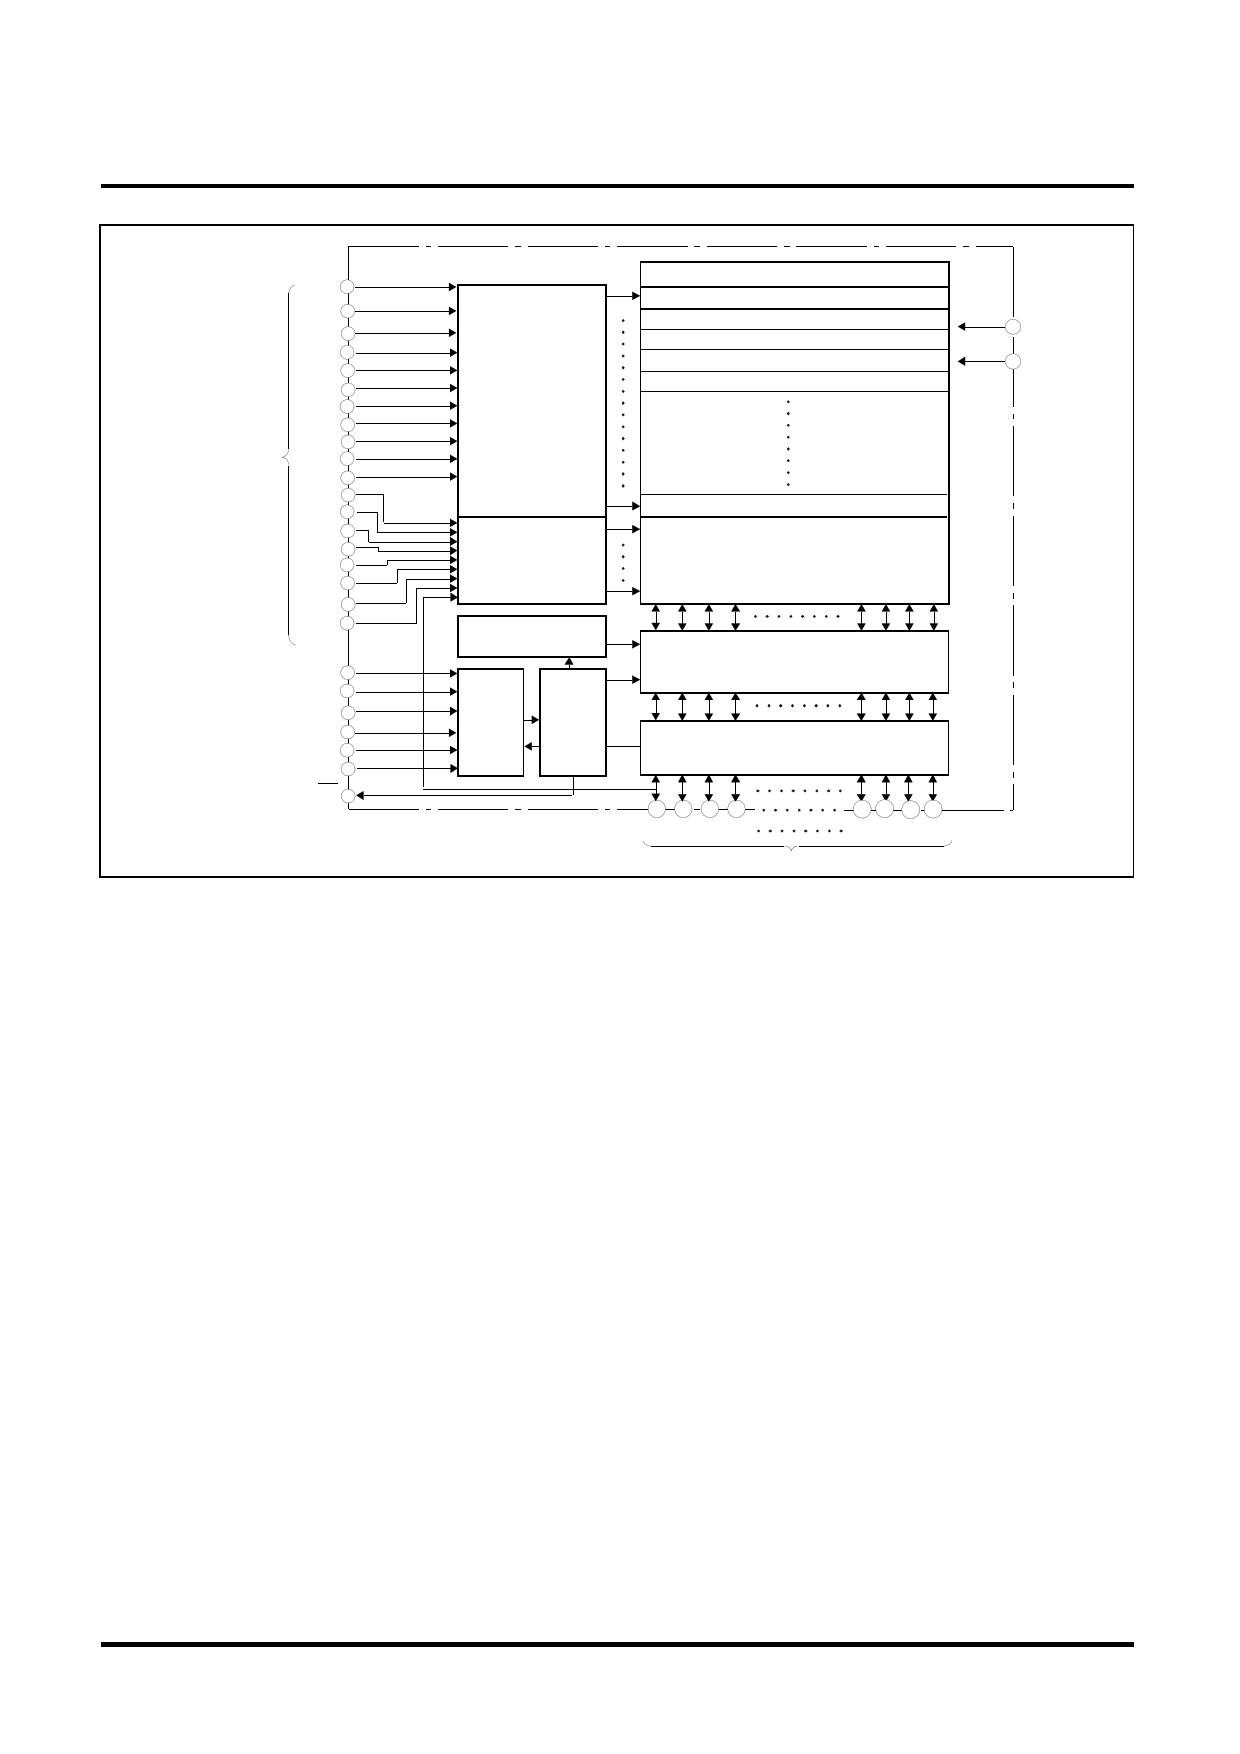 M5M29FT800VP-12 pdf, equivalent, schematic